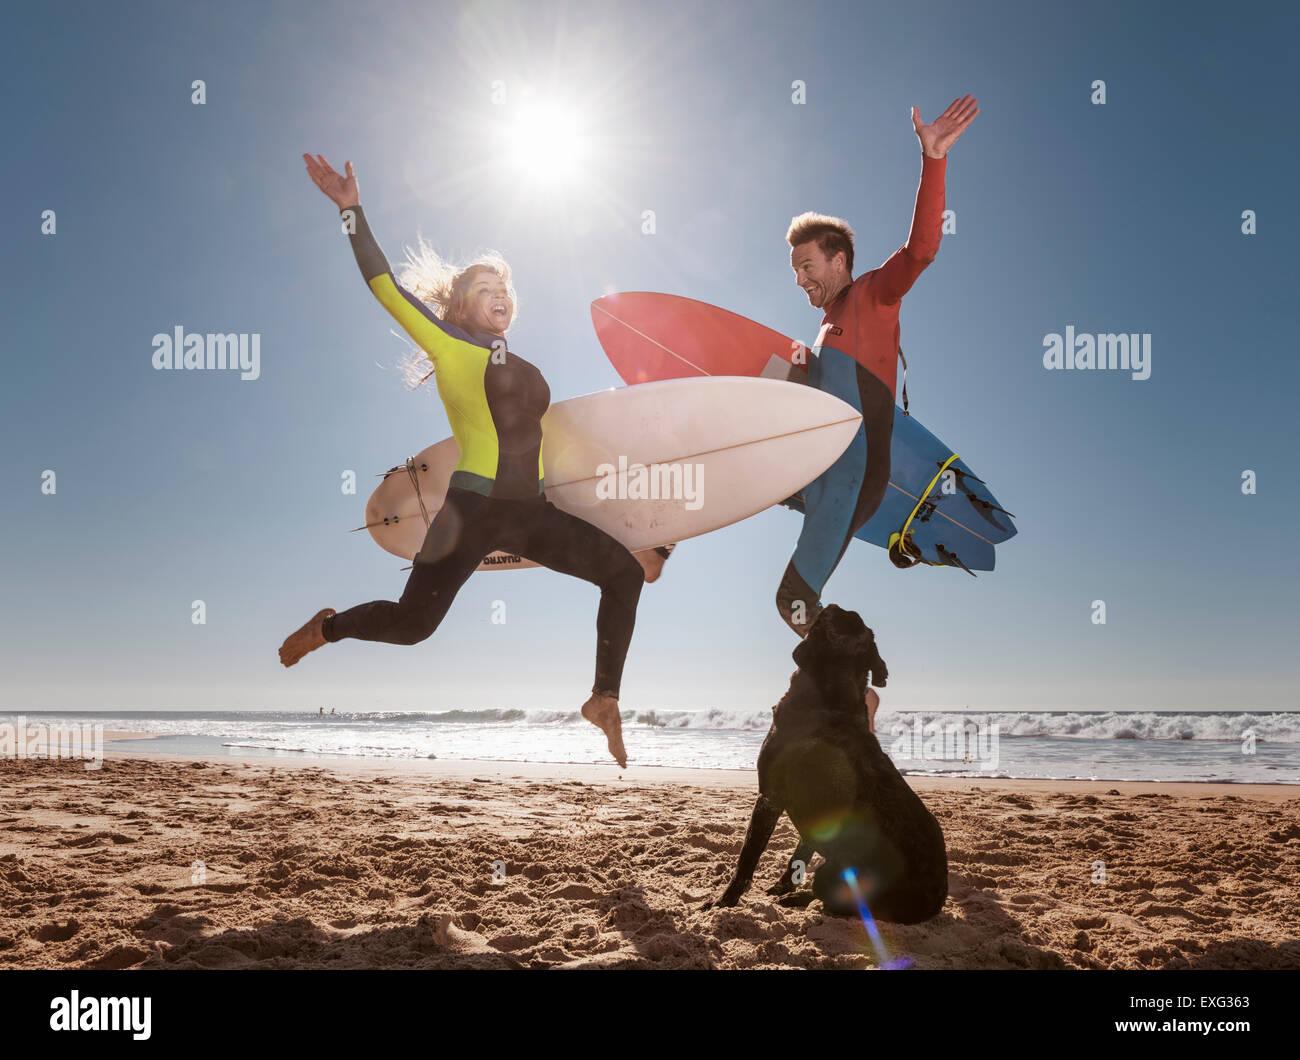 Couple of crazy surfers. El Palmar, Tarifa, Cadiz, Costa de la Luz, Andalusia, Southern Spain. - Stock Image